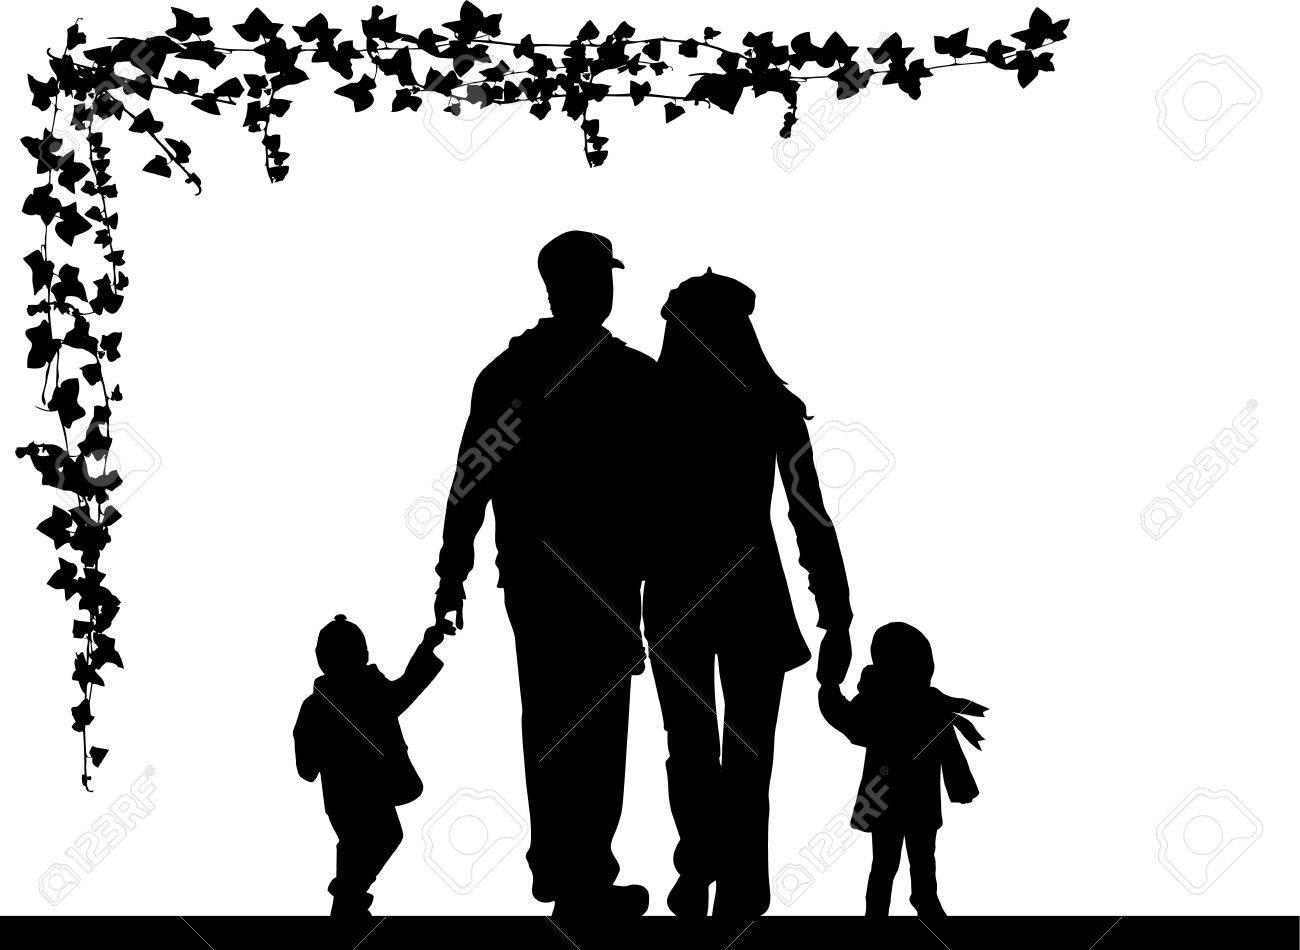 Family silhouette Stock Vector - 17566186